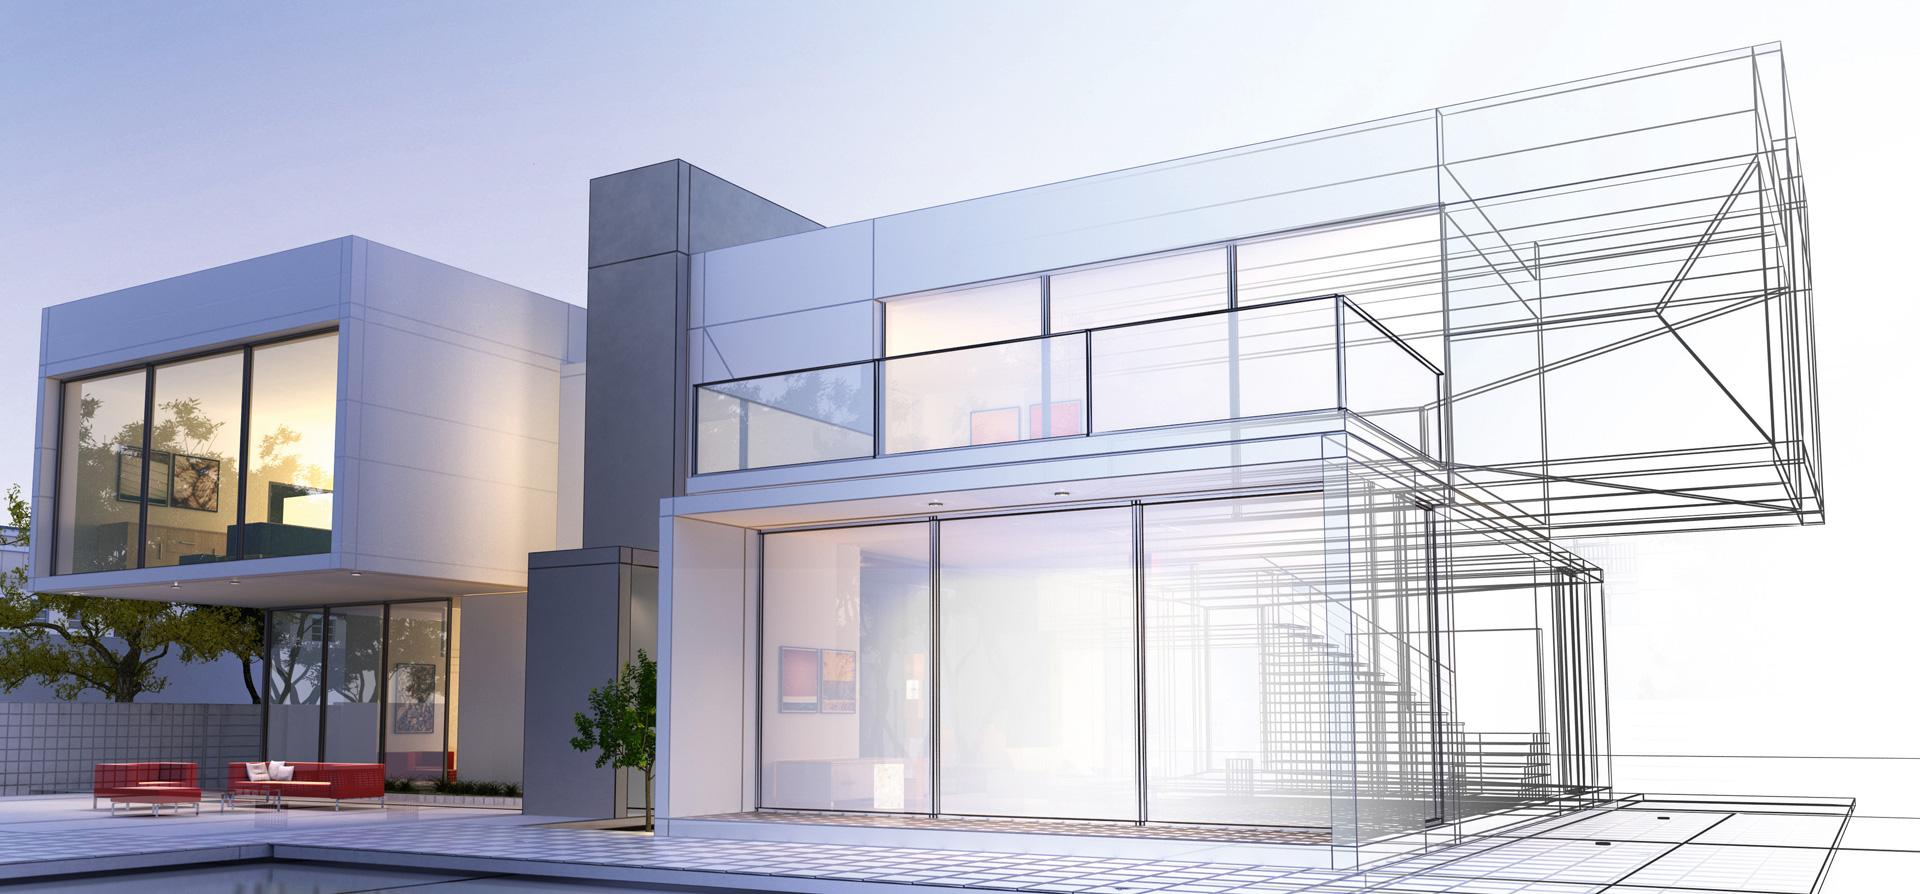 gealan kubus widmaier gmbh. Black Bedroom Furniture Sets. Home Design Ideas